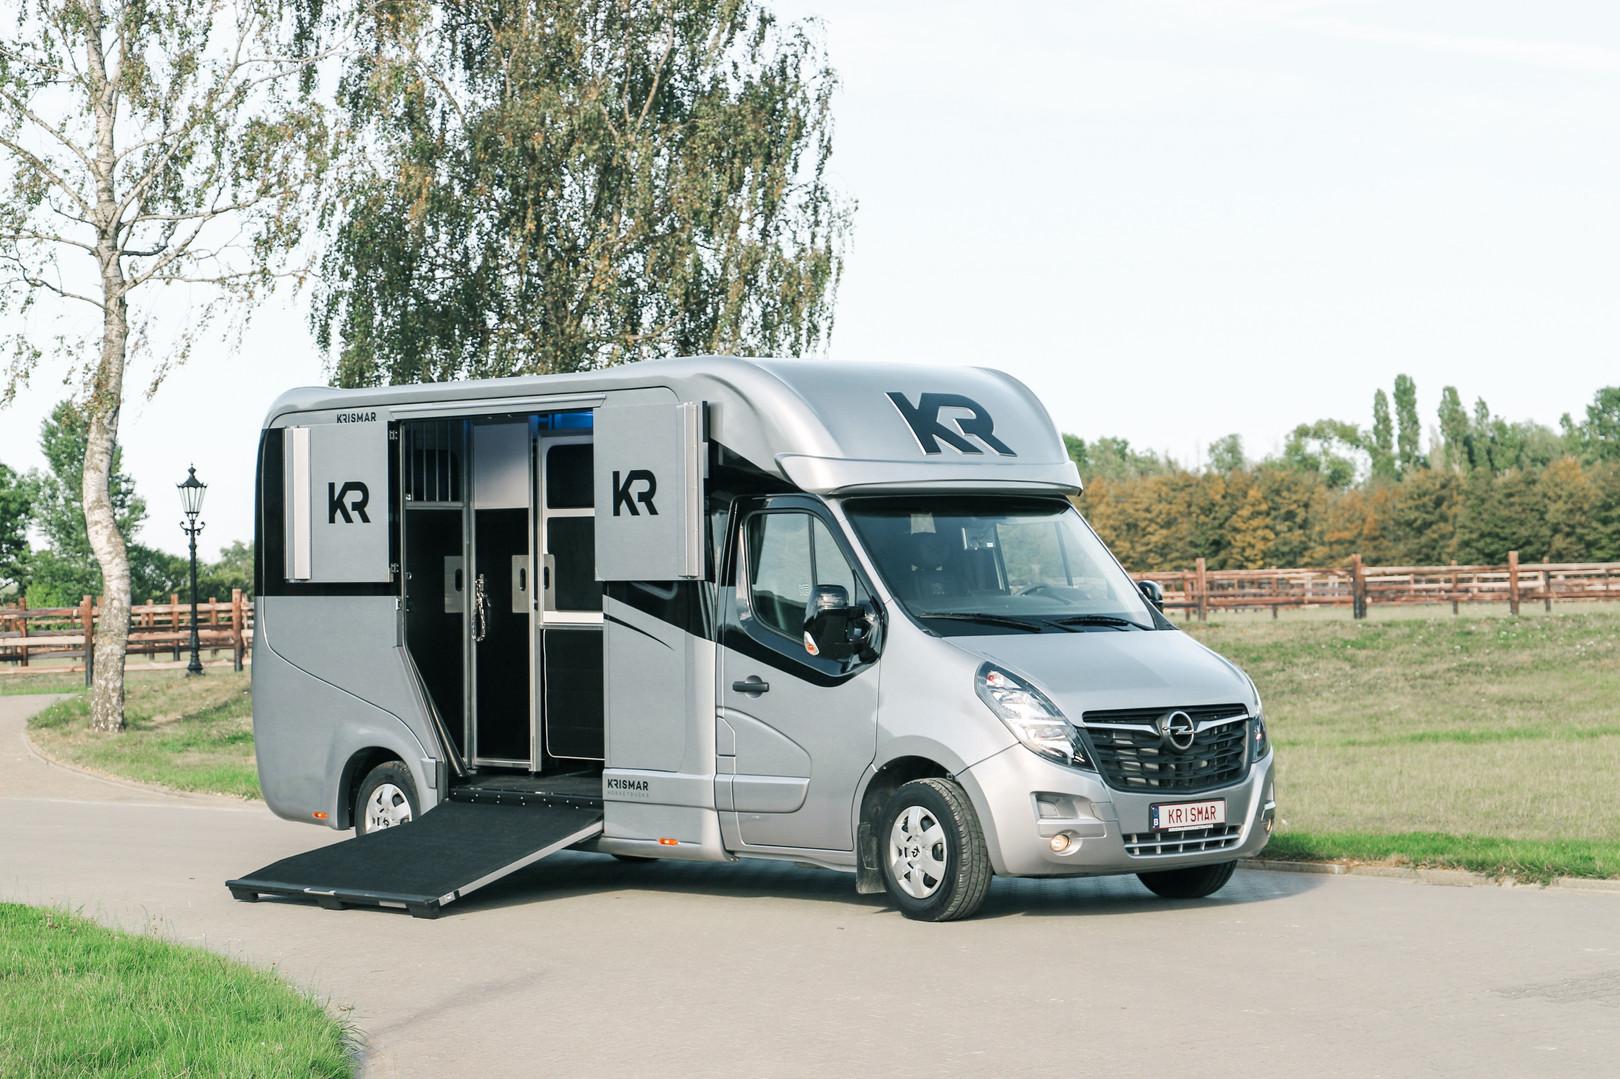 krismar 2 horse truck 5973.jpg